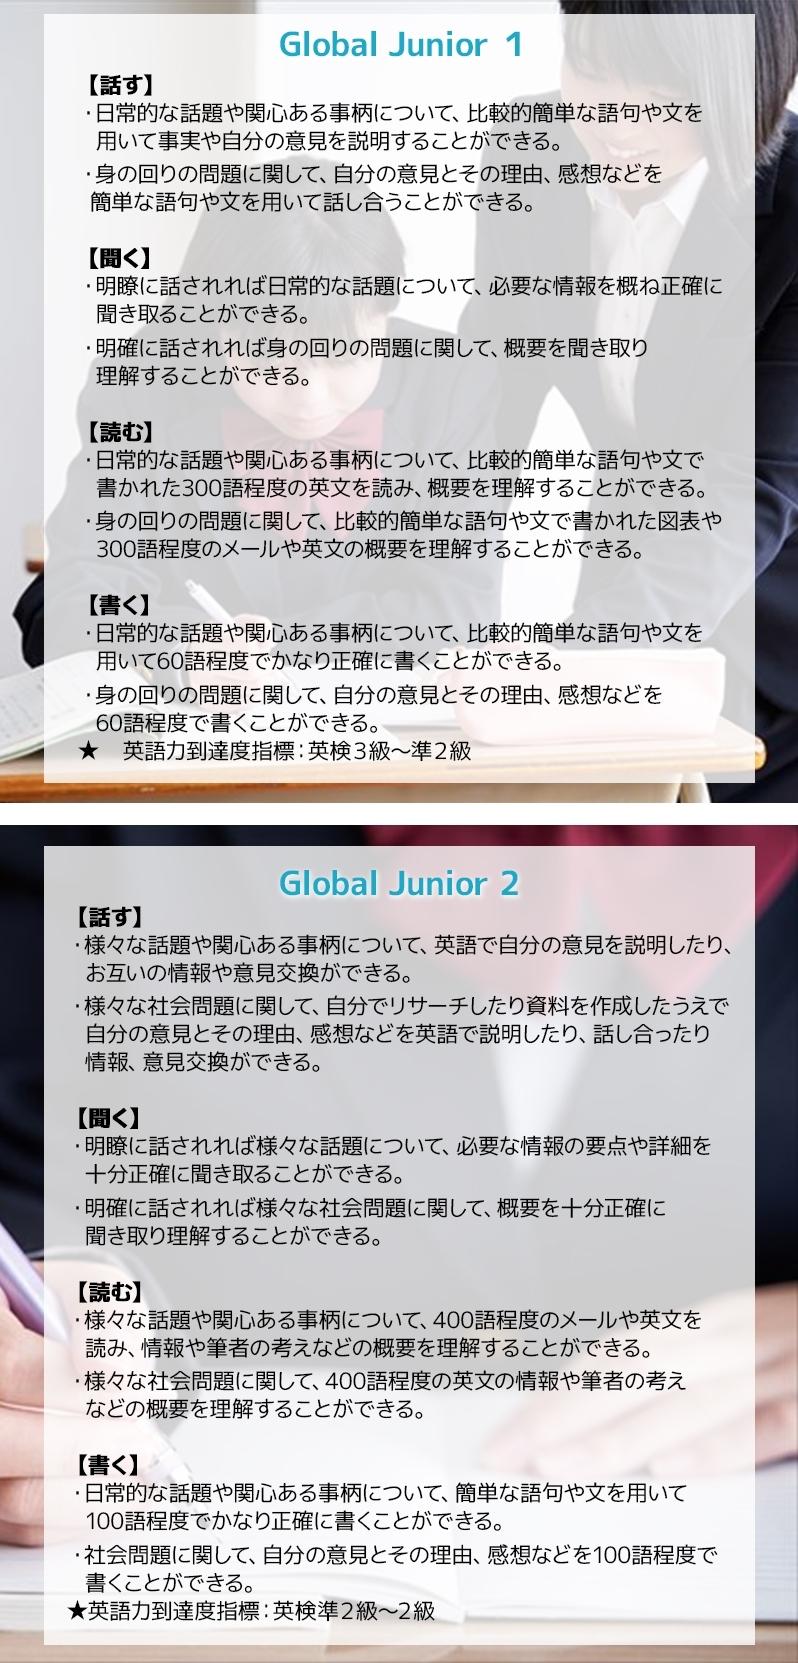 Global Junior(中学生)